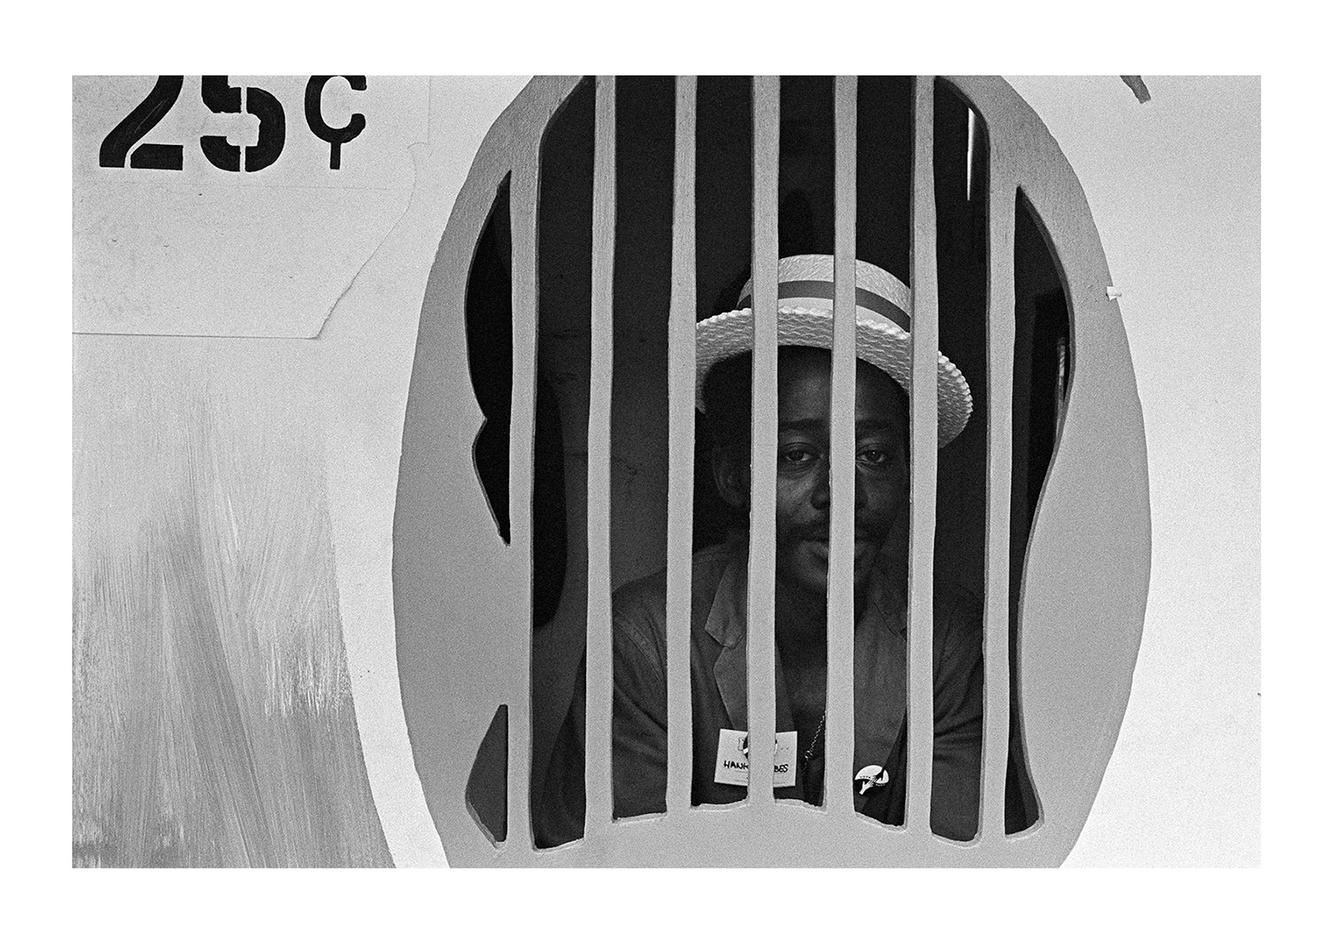 Man Inside a Ticket Booth, Detroit 1972